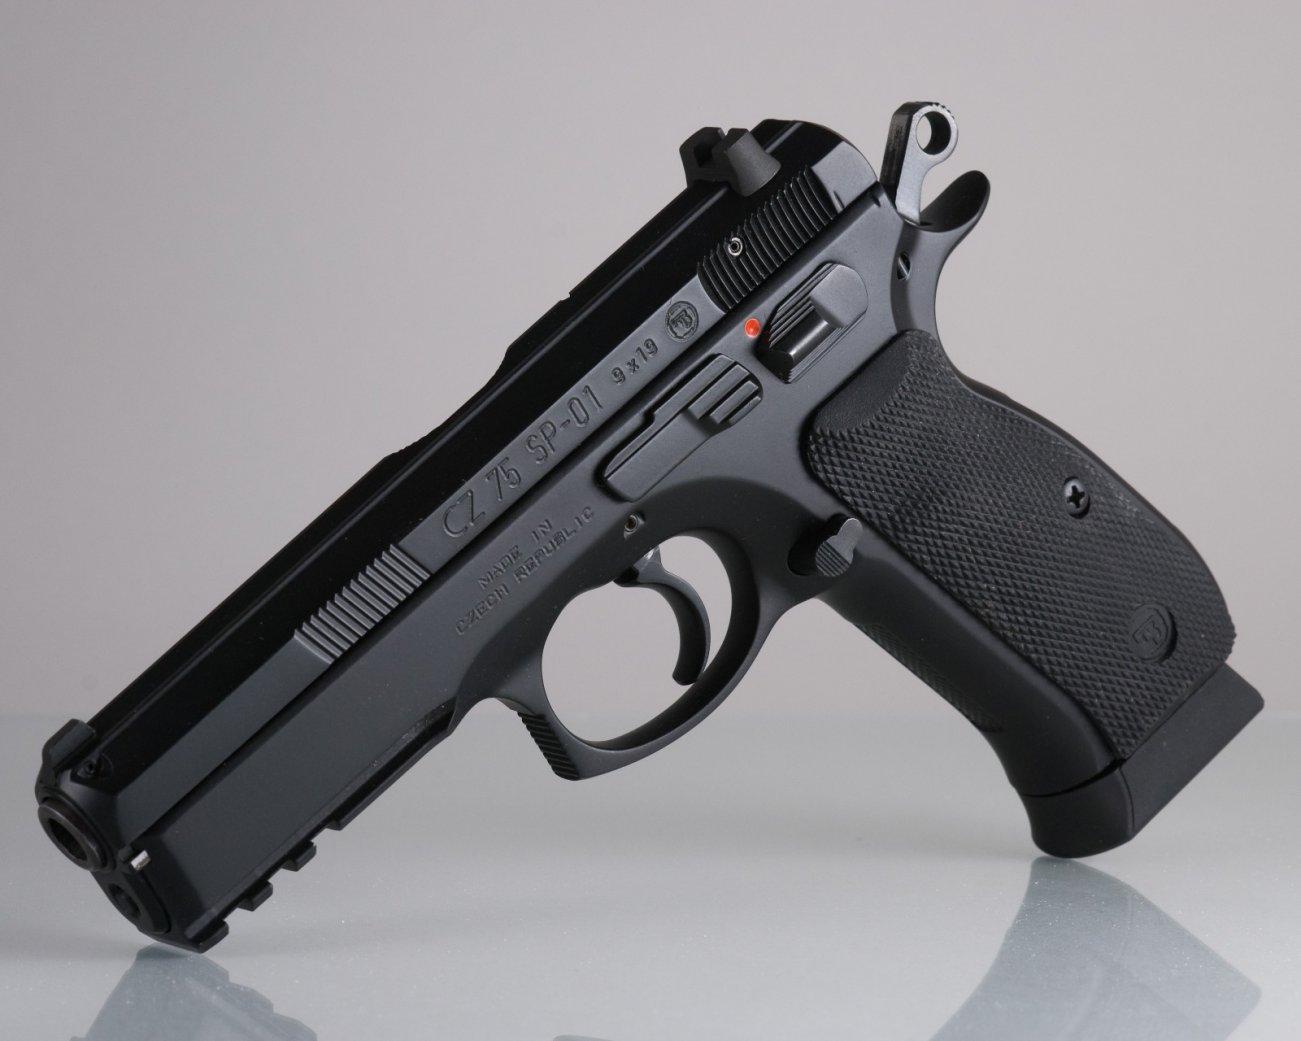 Why the Glock 17, CZ 75, and SiG Sauer P226 Dominate the Handgun Market